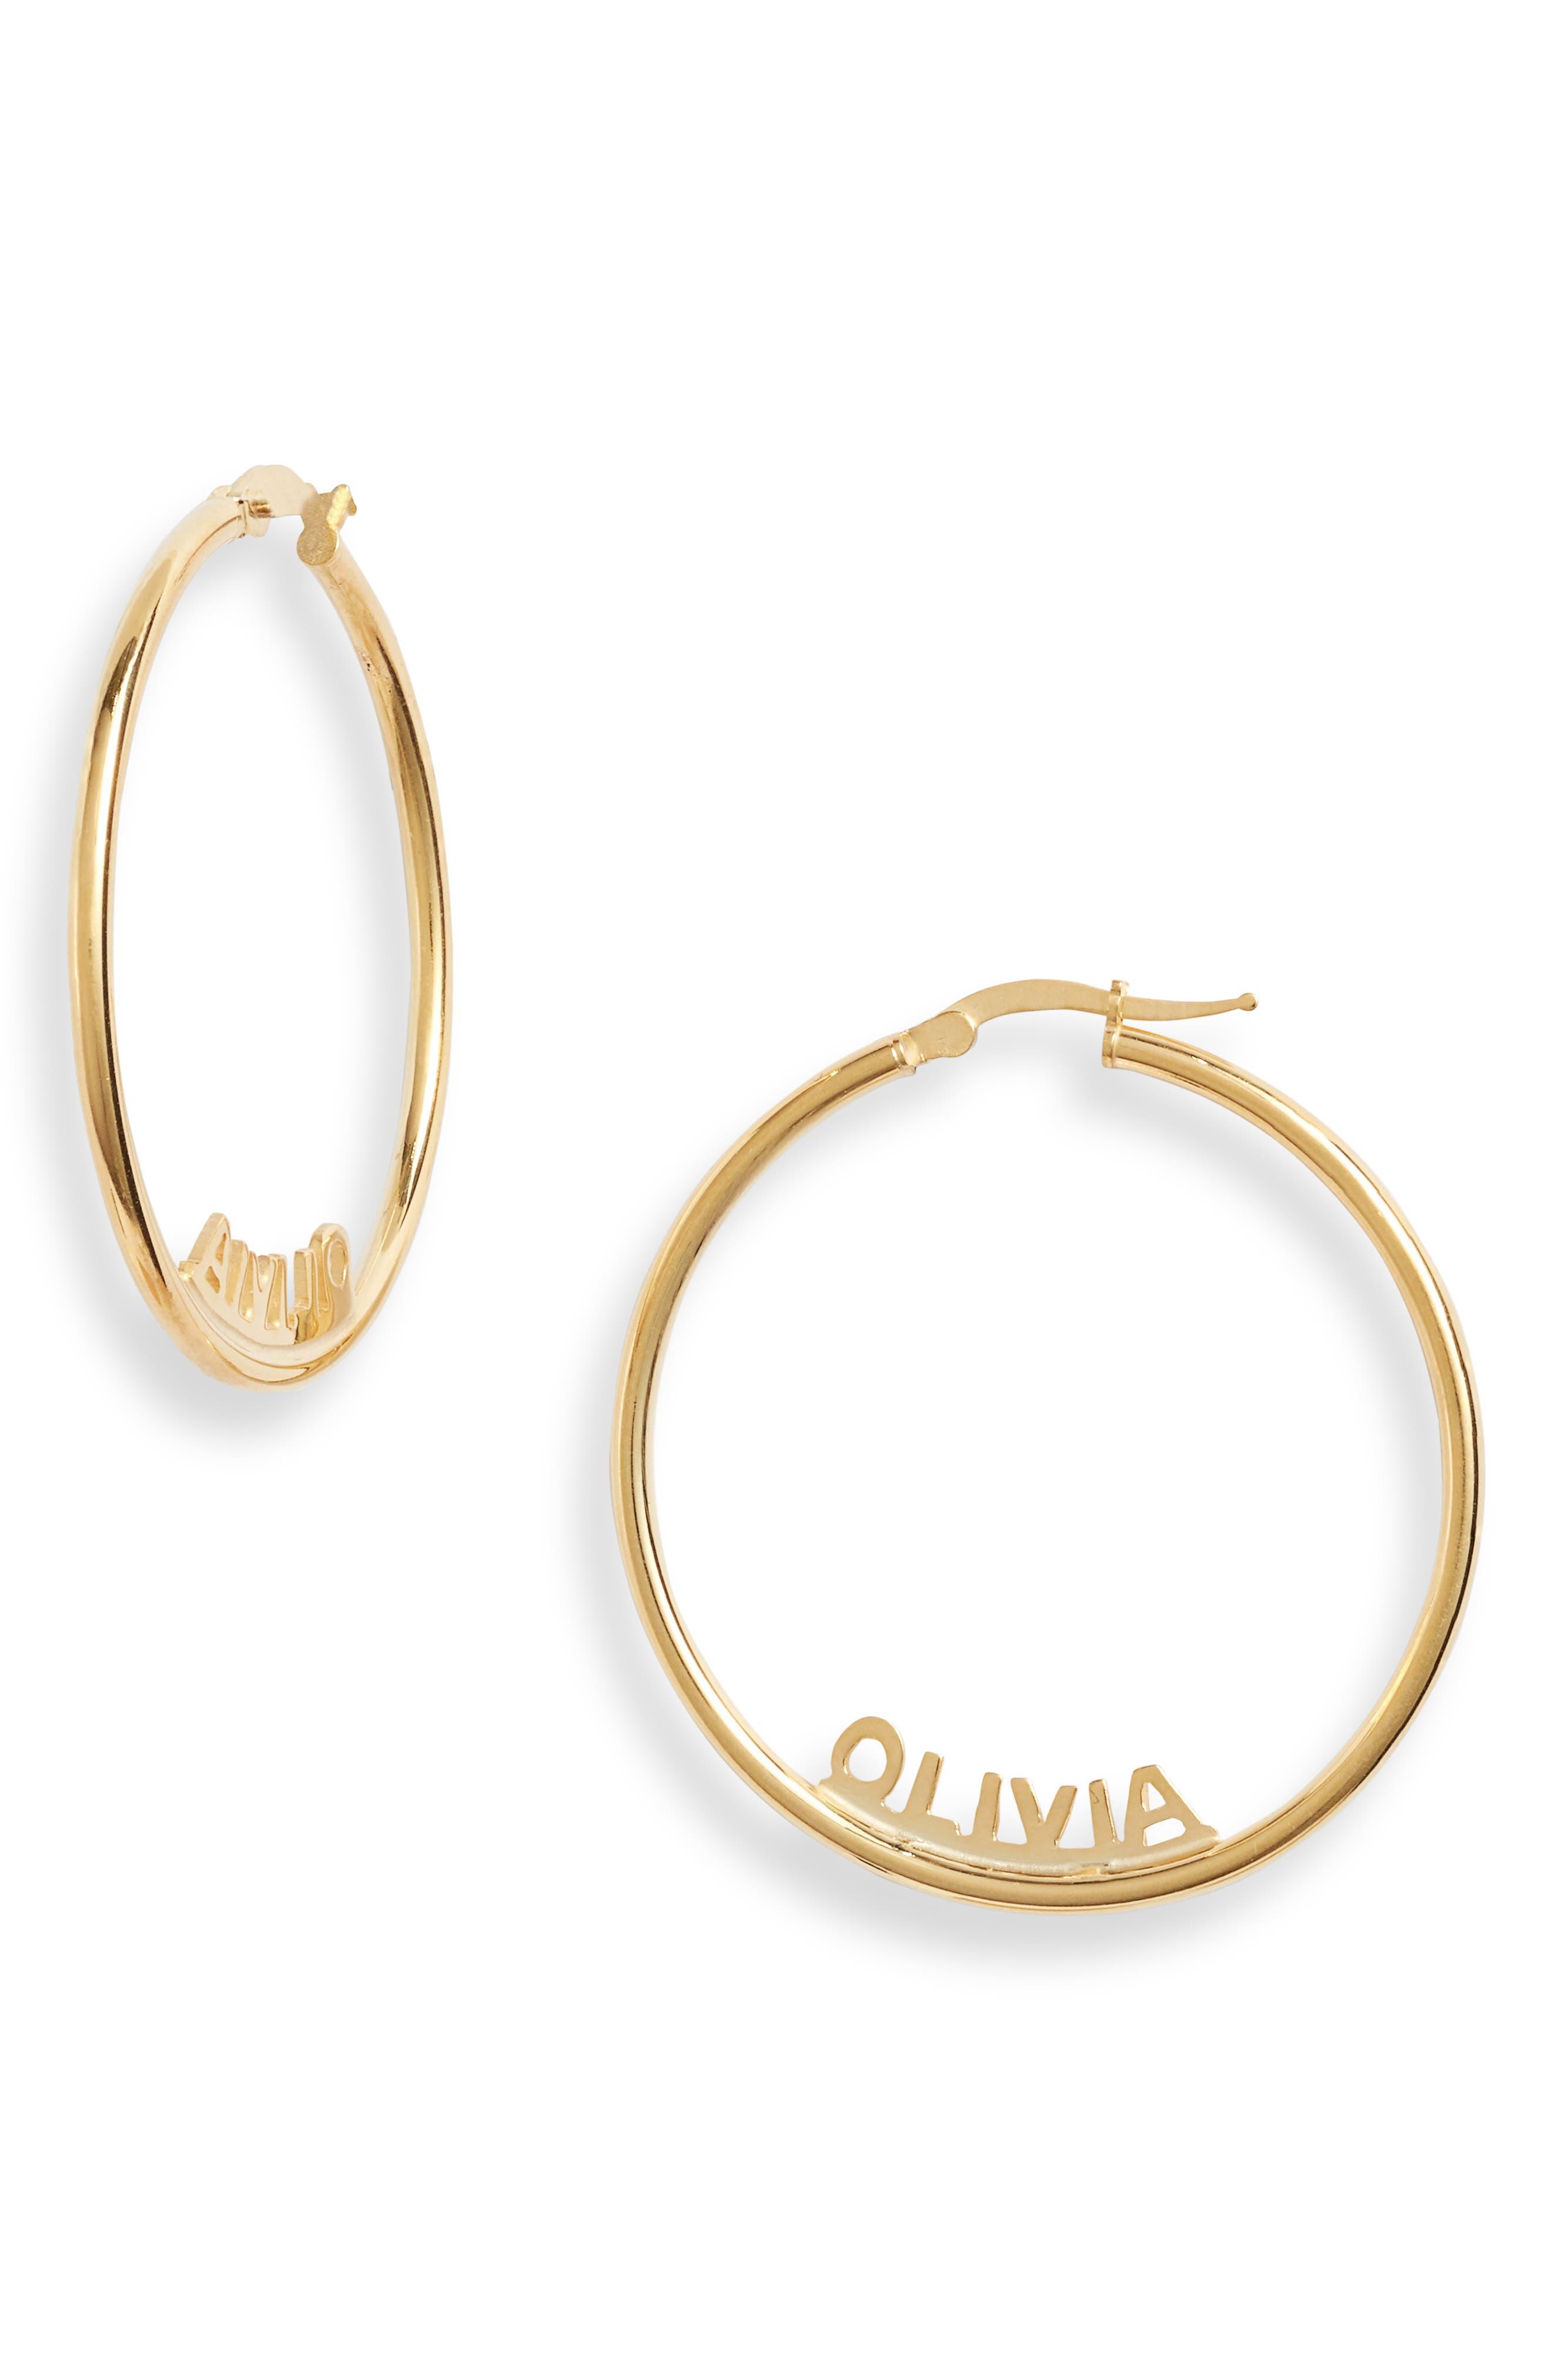 Women's Argento Vivo Personalized Name Hoop Earrings